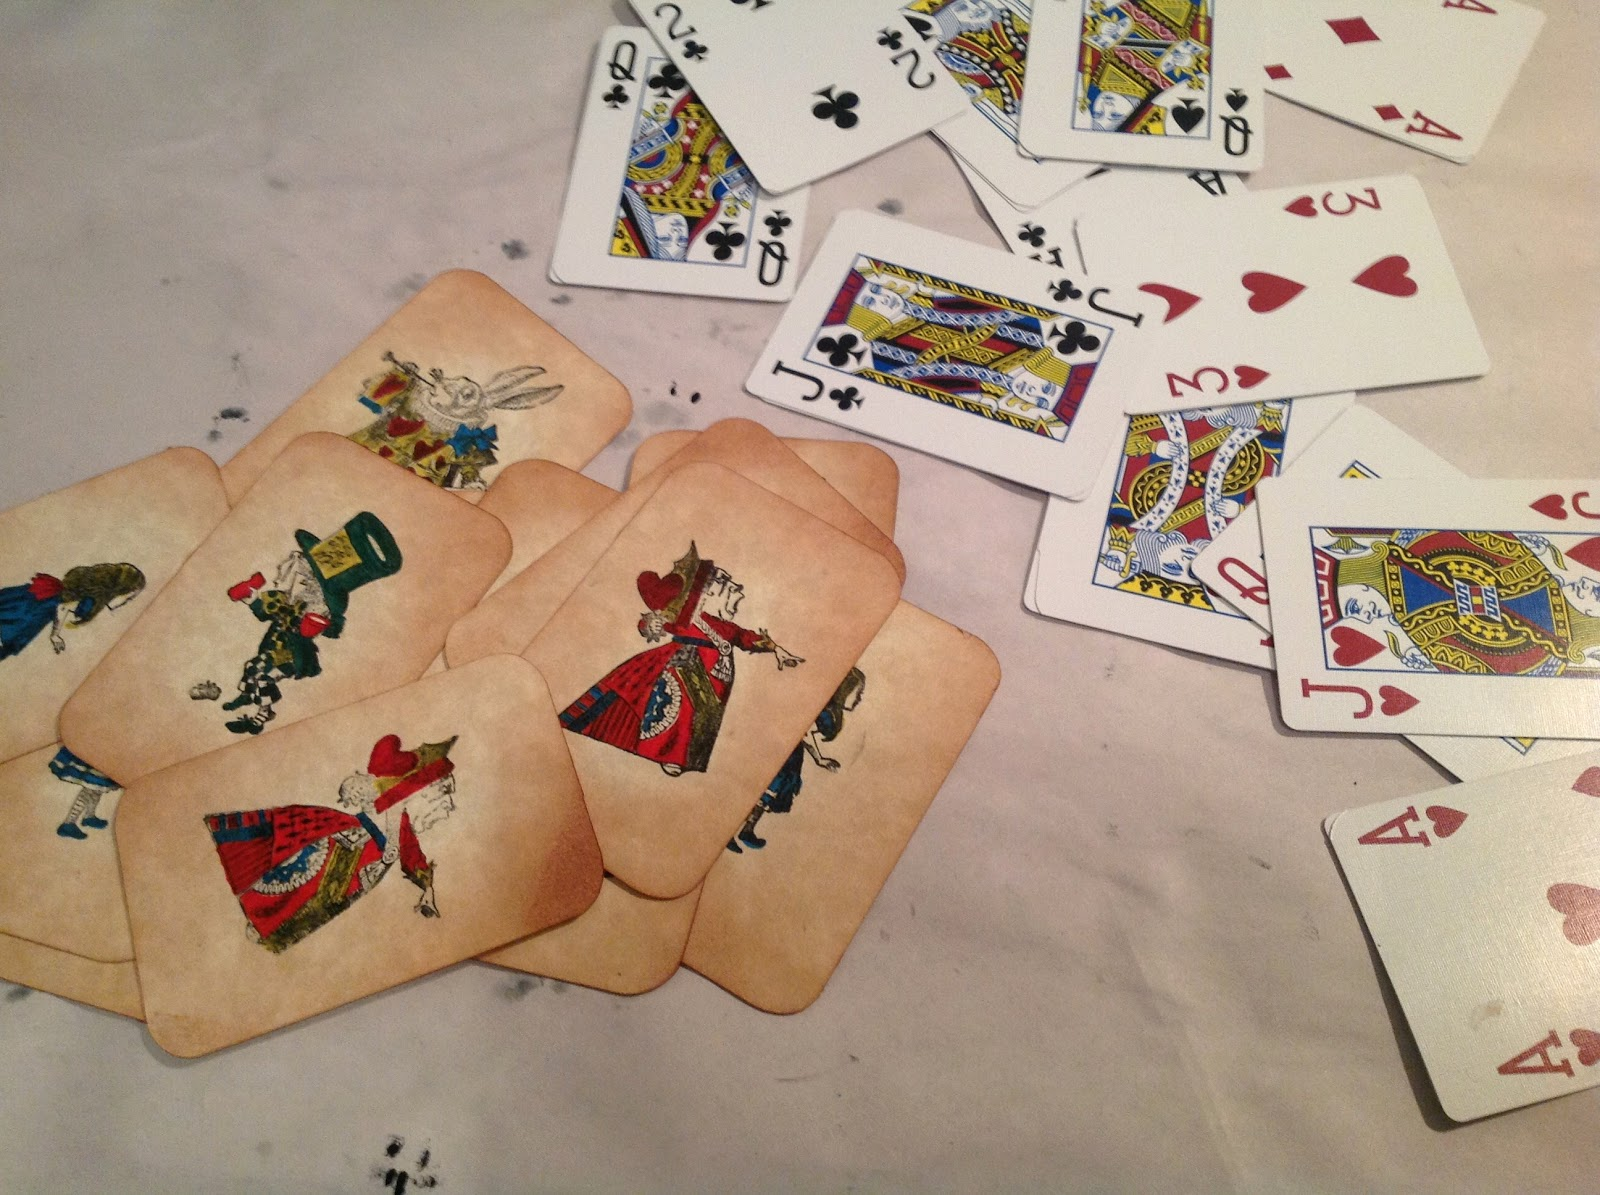 Craft room secrets alice in wonderland diy christmas garland for Alice in wonderland crafts